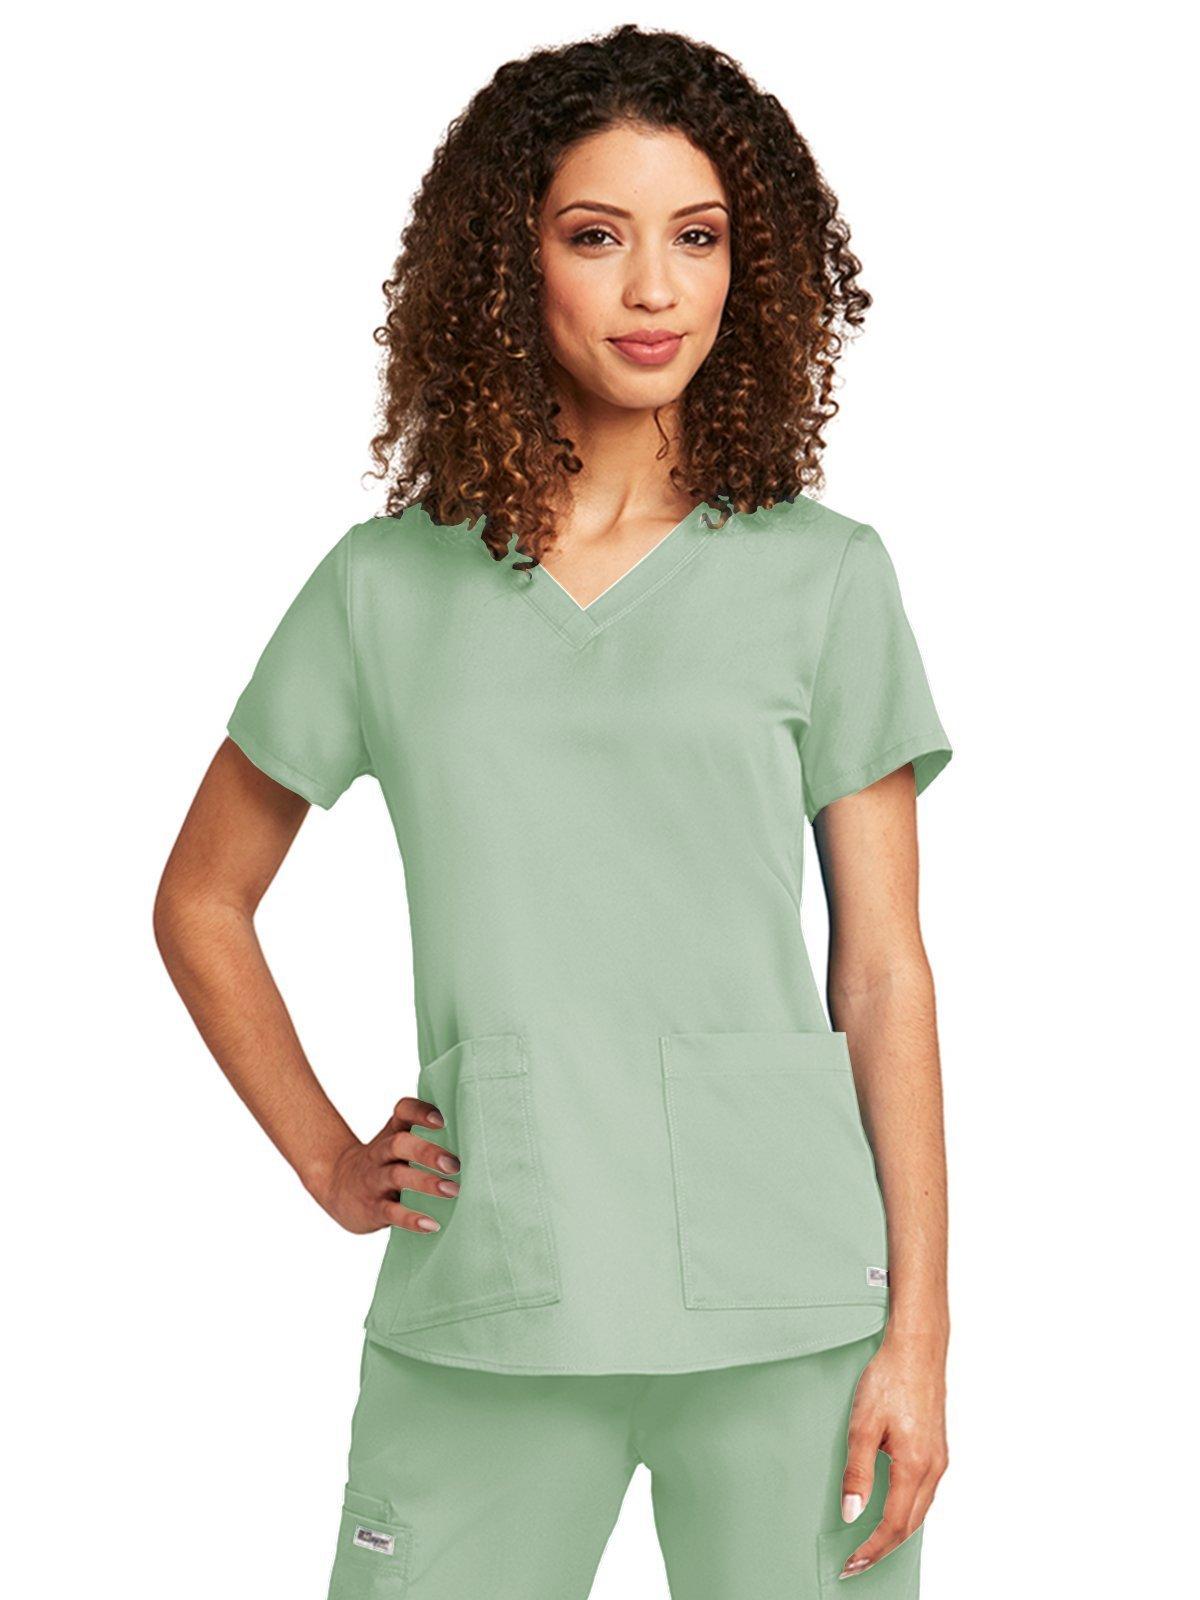 Grey's Anatomy 71166 V-Neck Top Pistachio 4XL